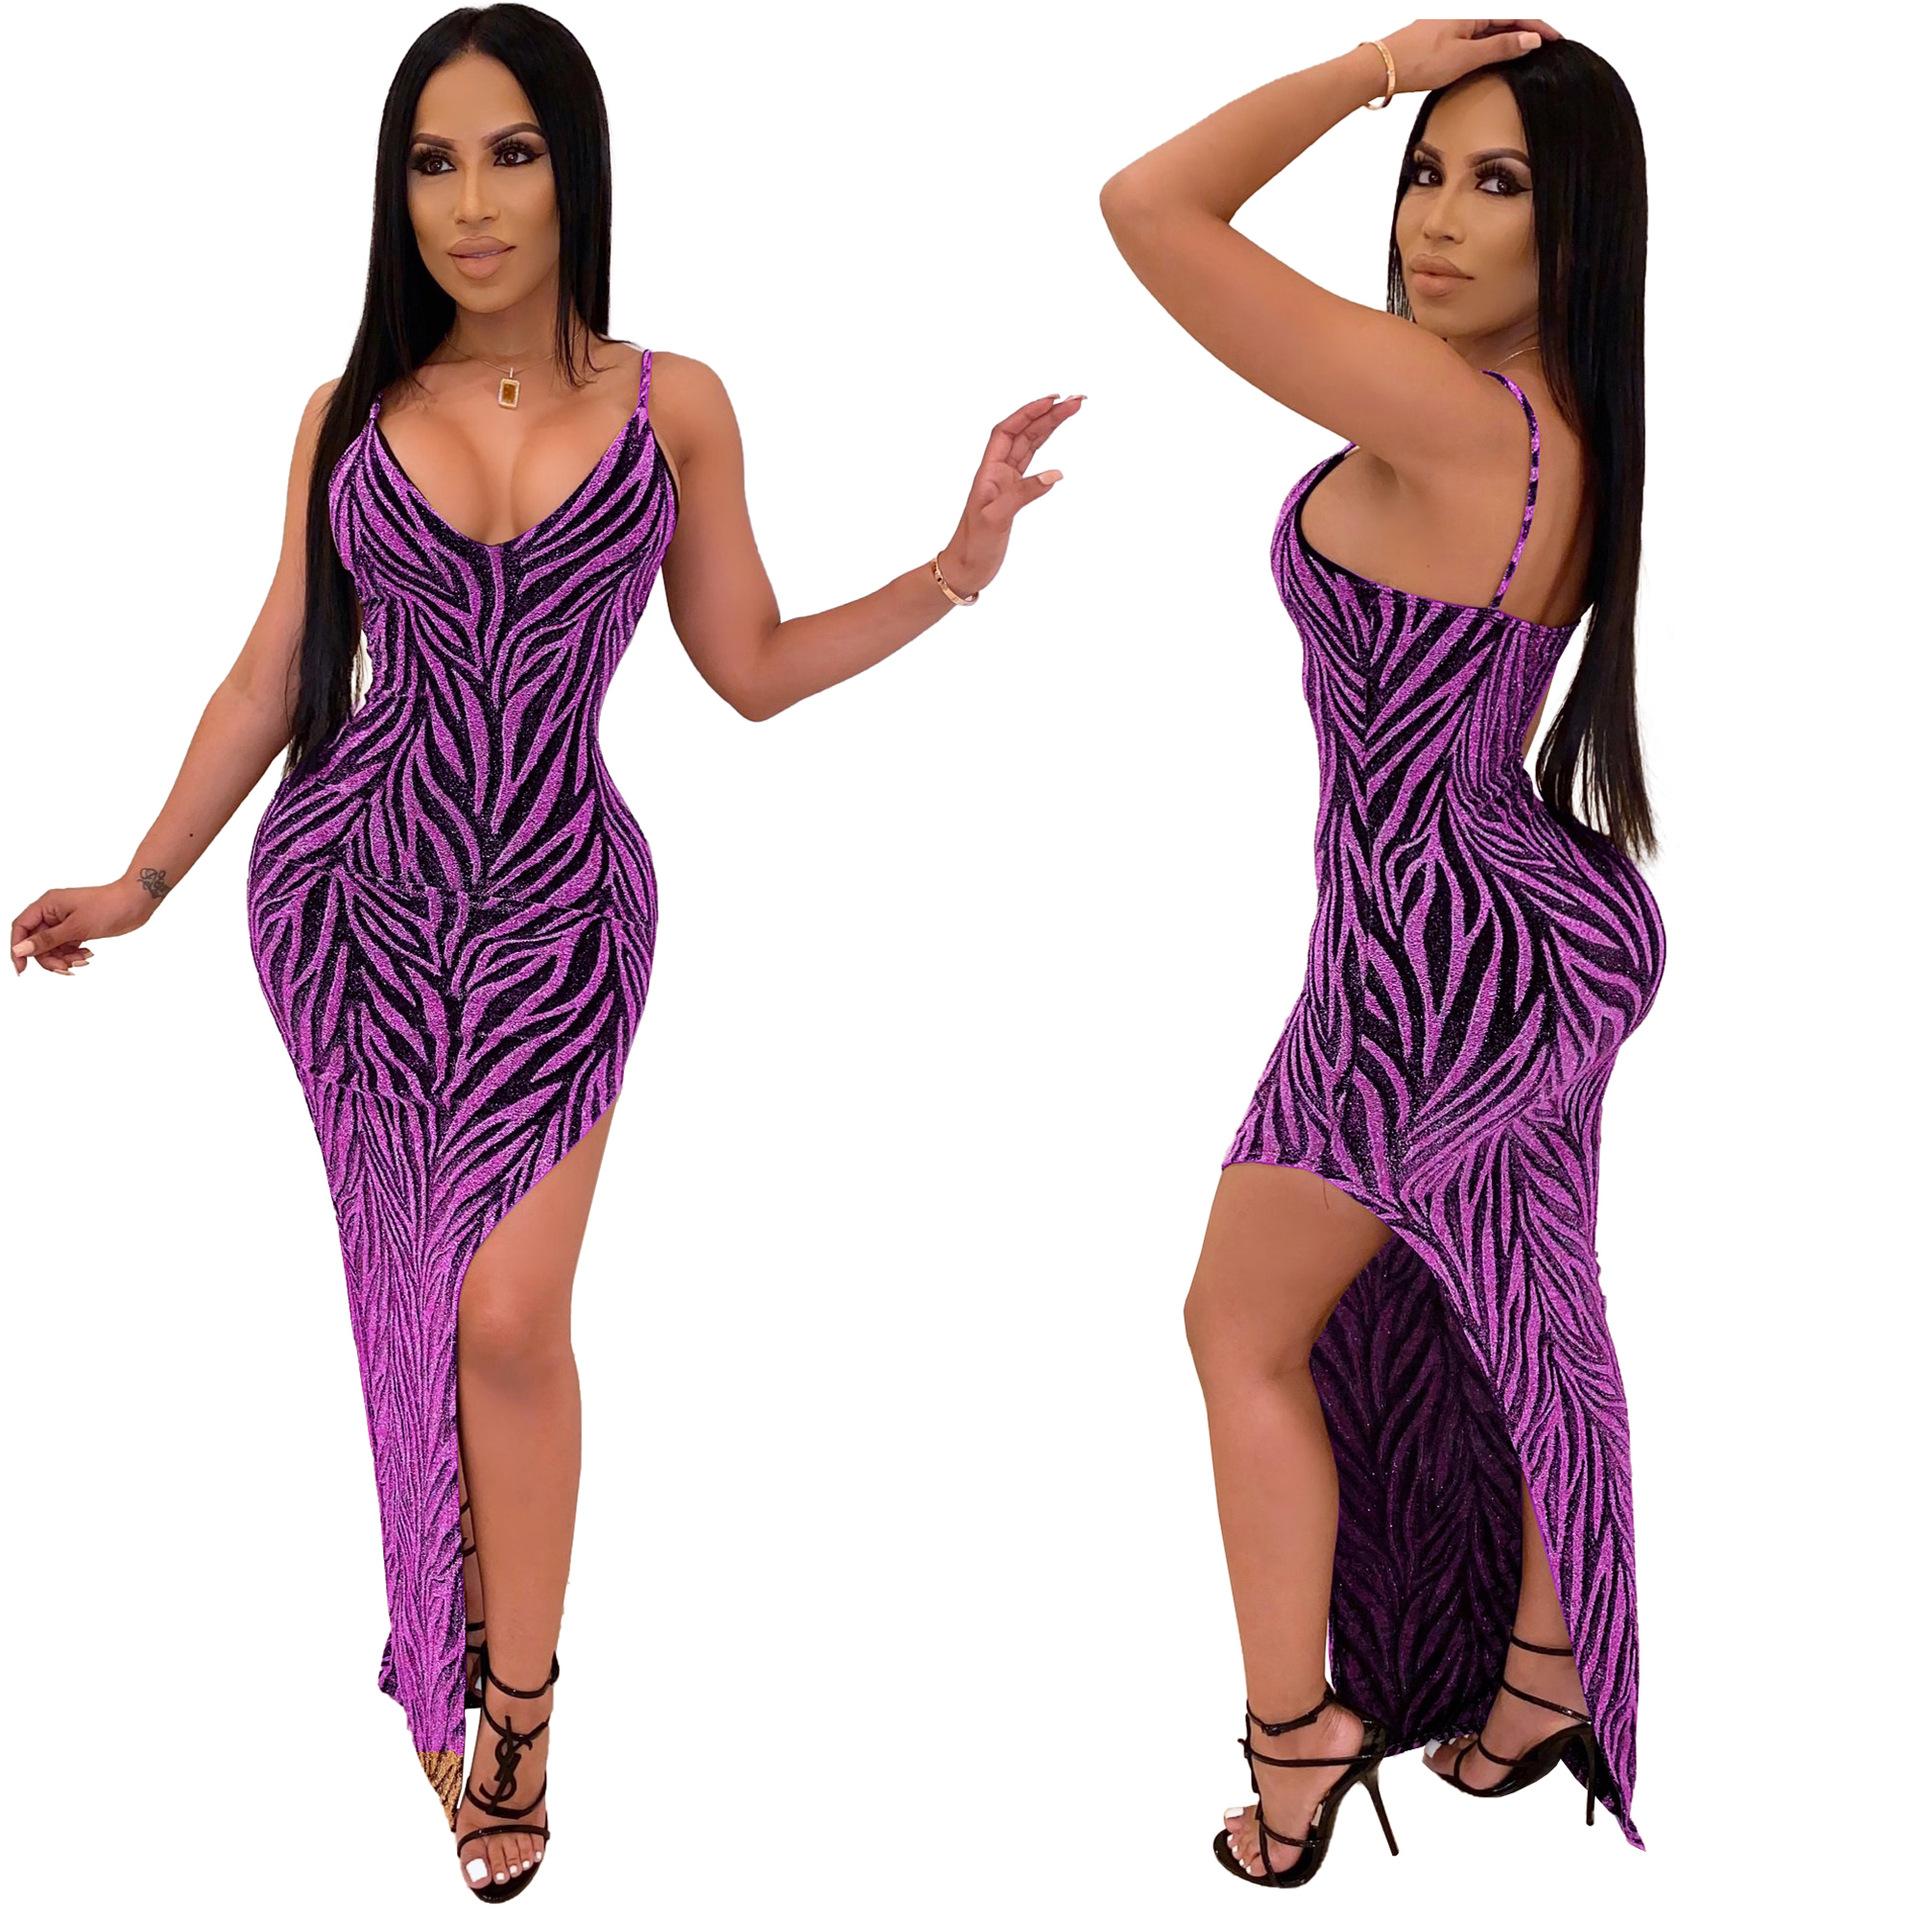 ML22454 Sexy Women Spaghetti Strap Bodycon Shiny Party Dress